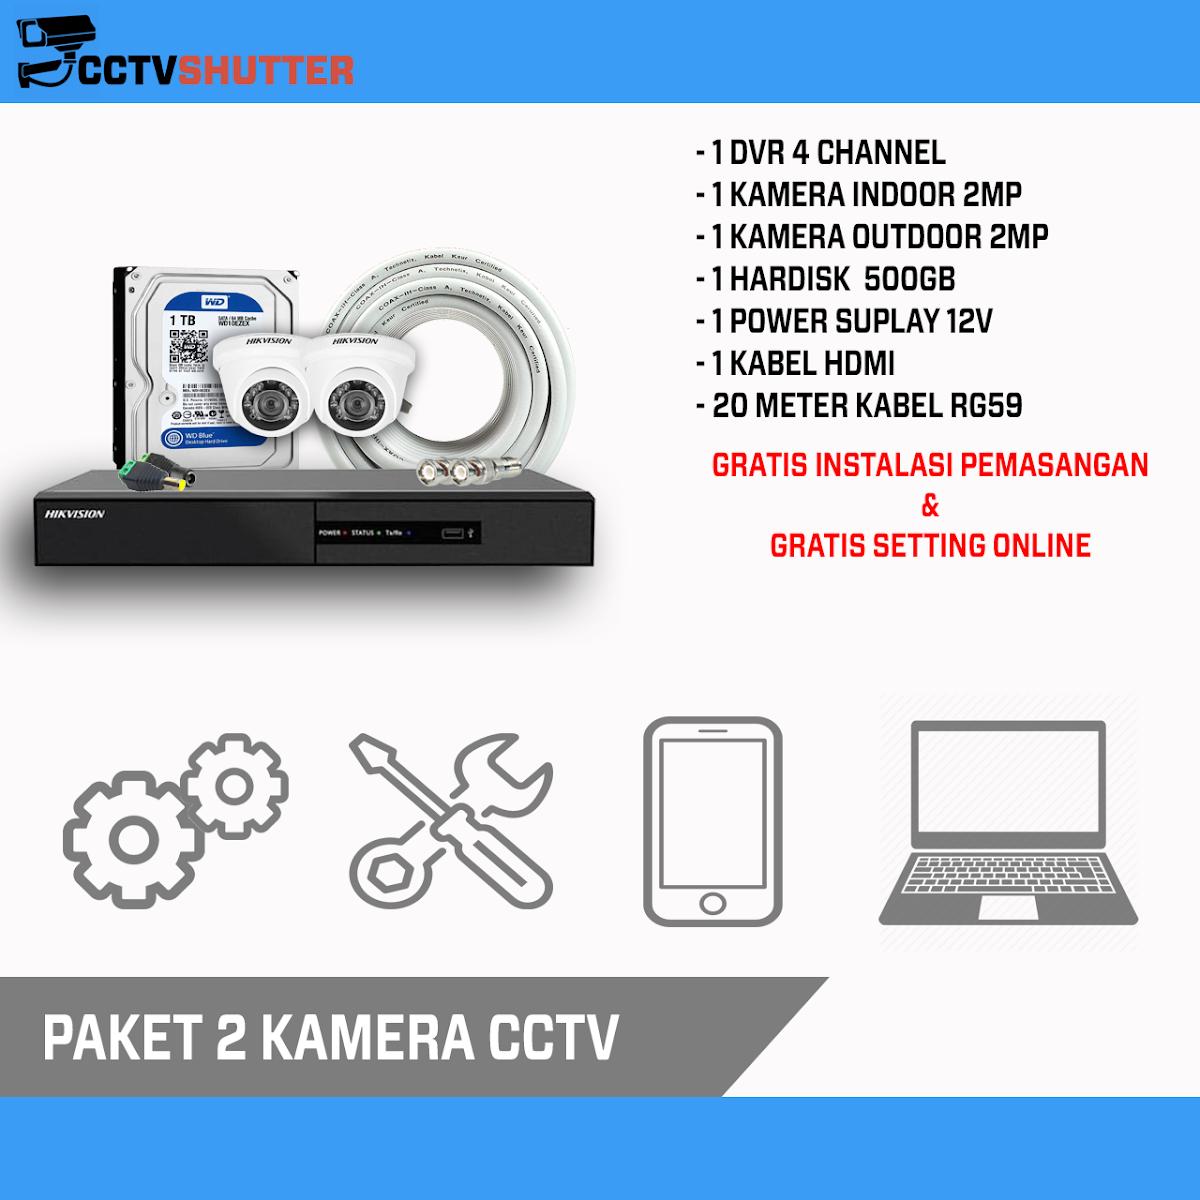 PASANG 12 KAMERA 2MP CCTV ONLINE MURAH